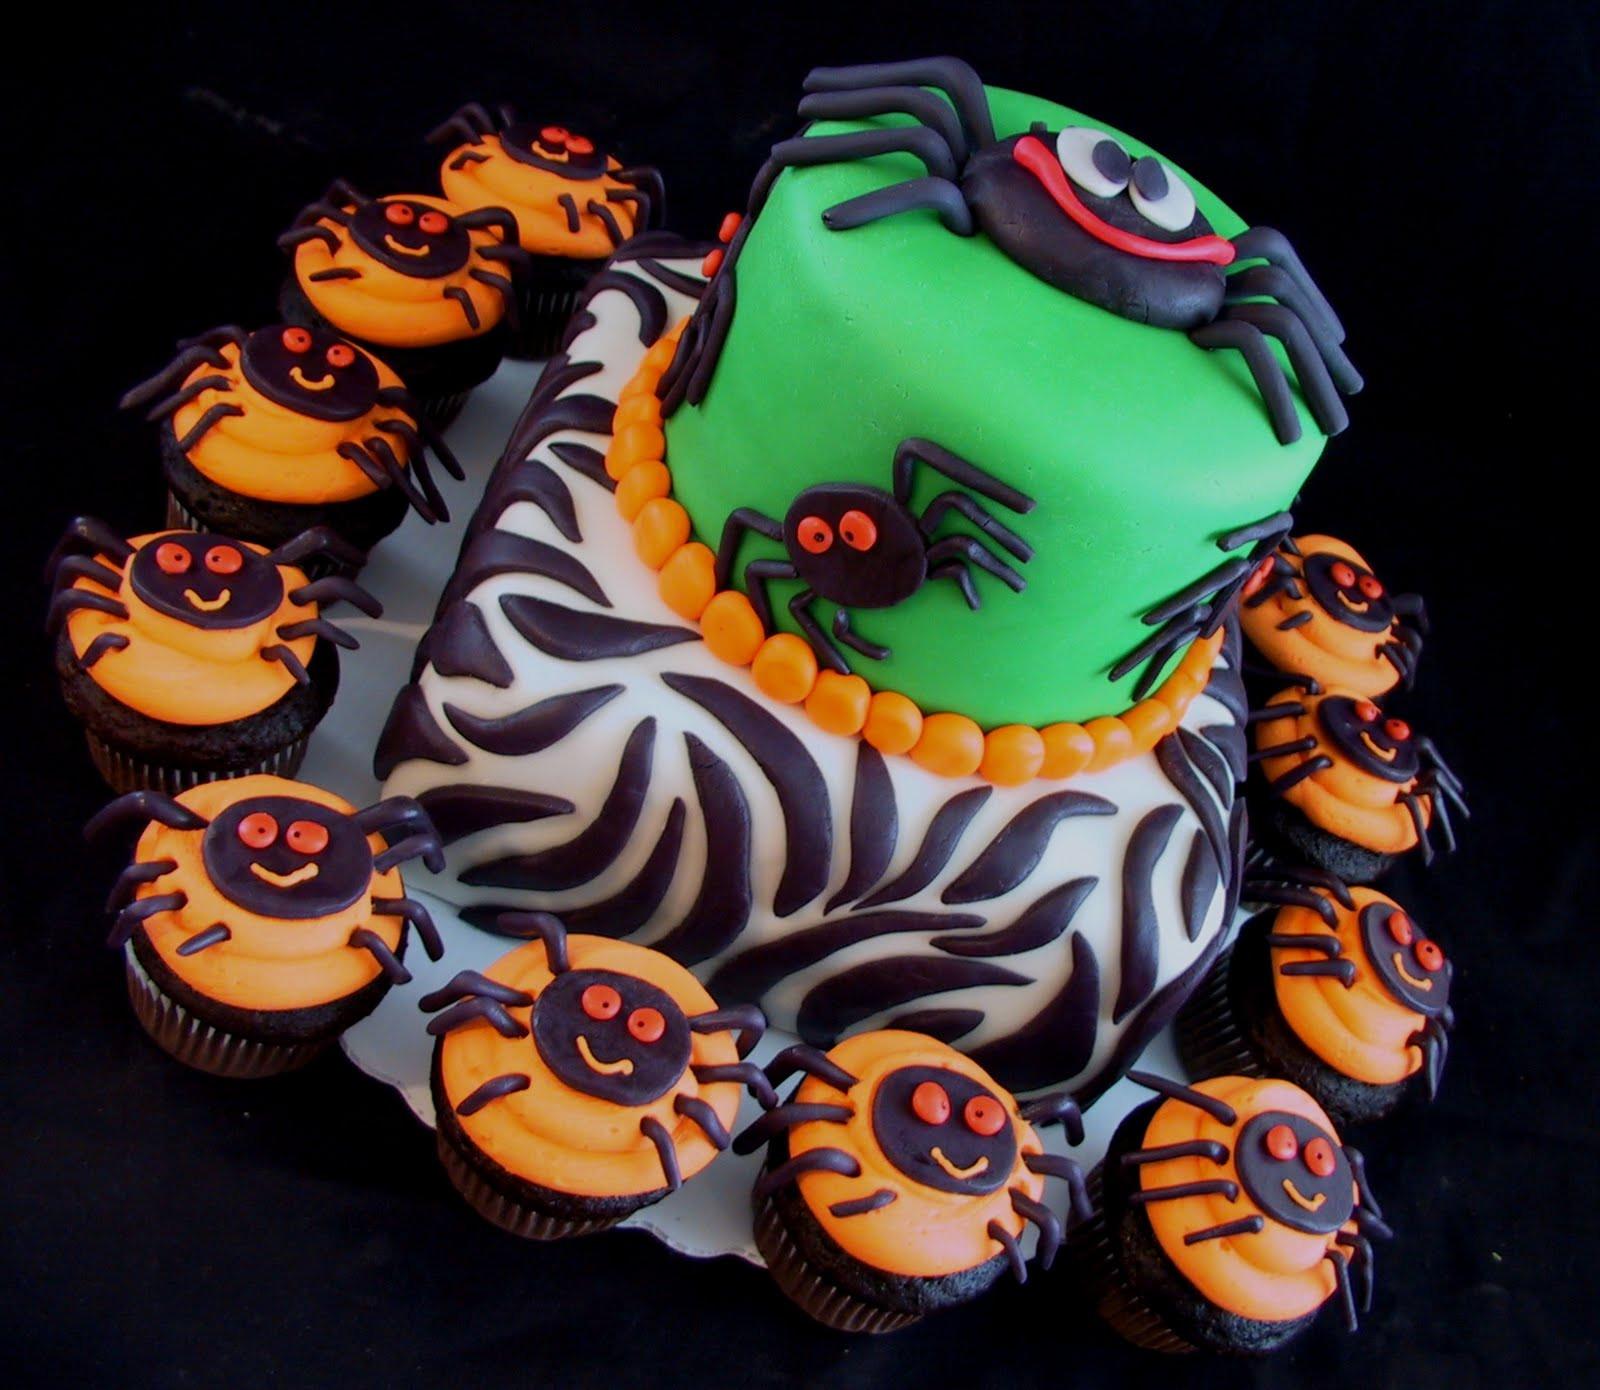 Halloween Birthday Cupcakes  Birthday Cake Center Halloween Birthday Cakes 2011